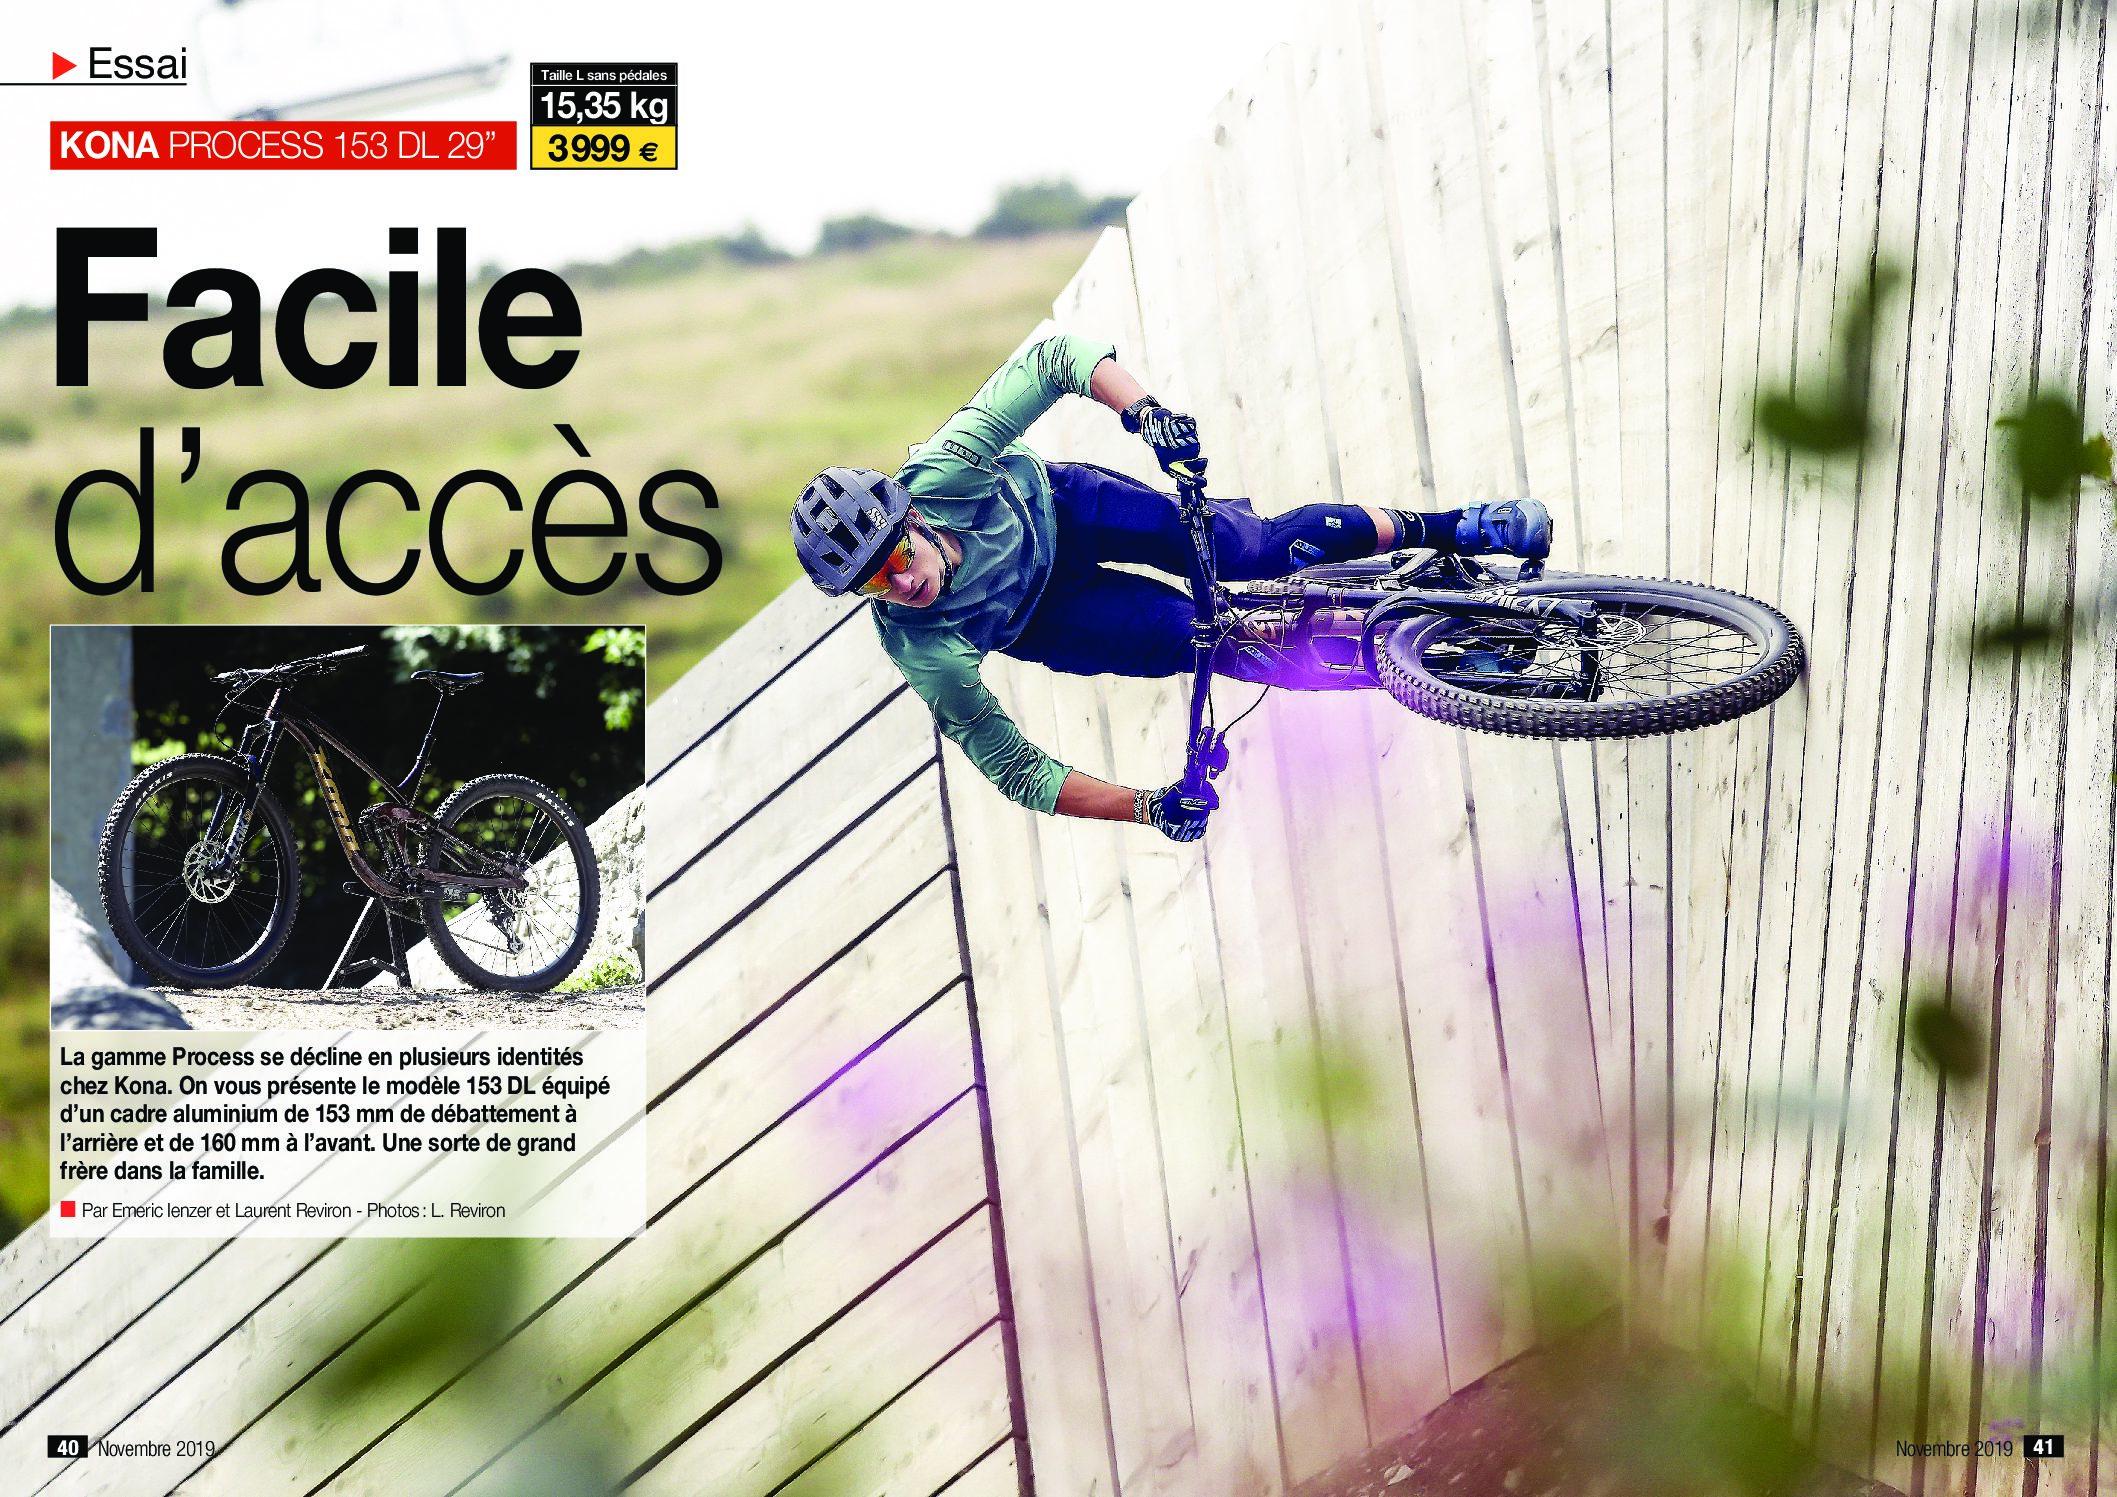 VTT Magazine loved our Process 153 DL 29!